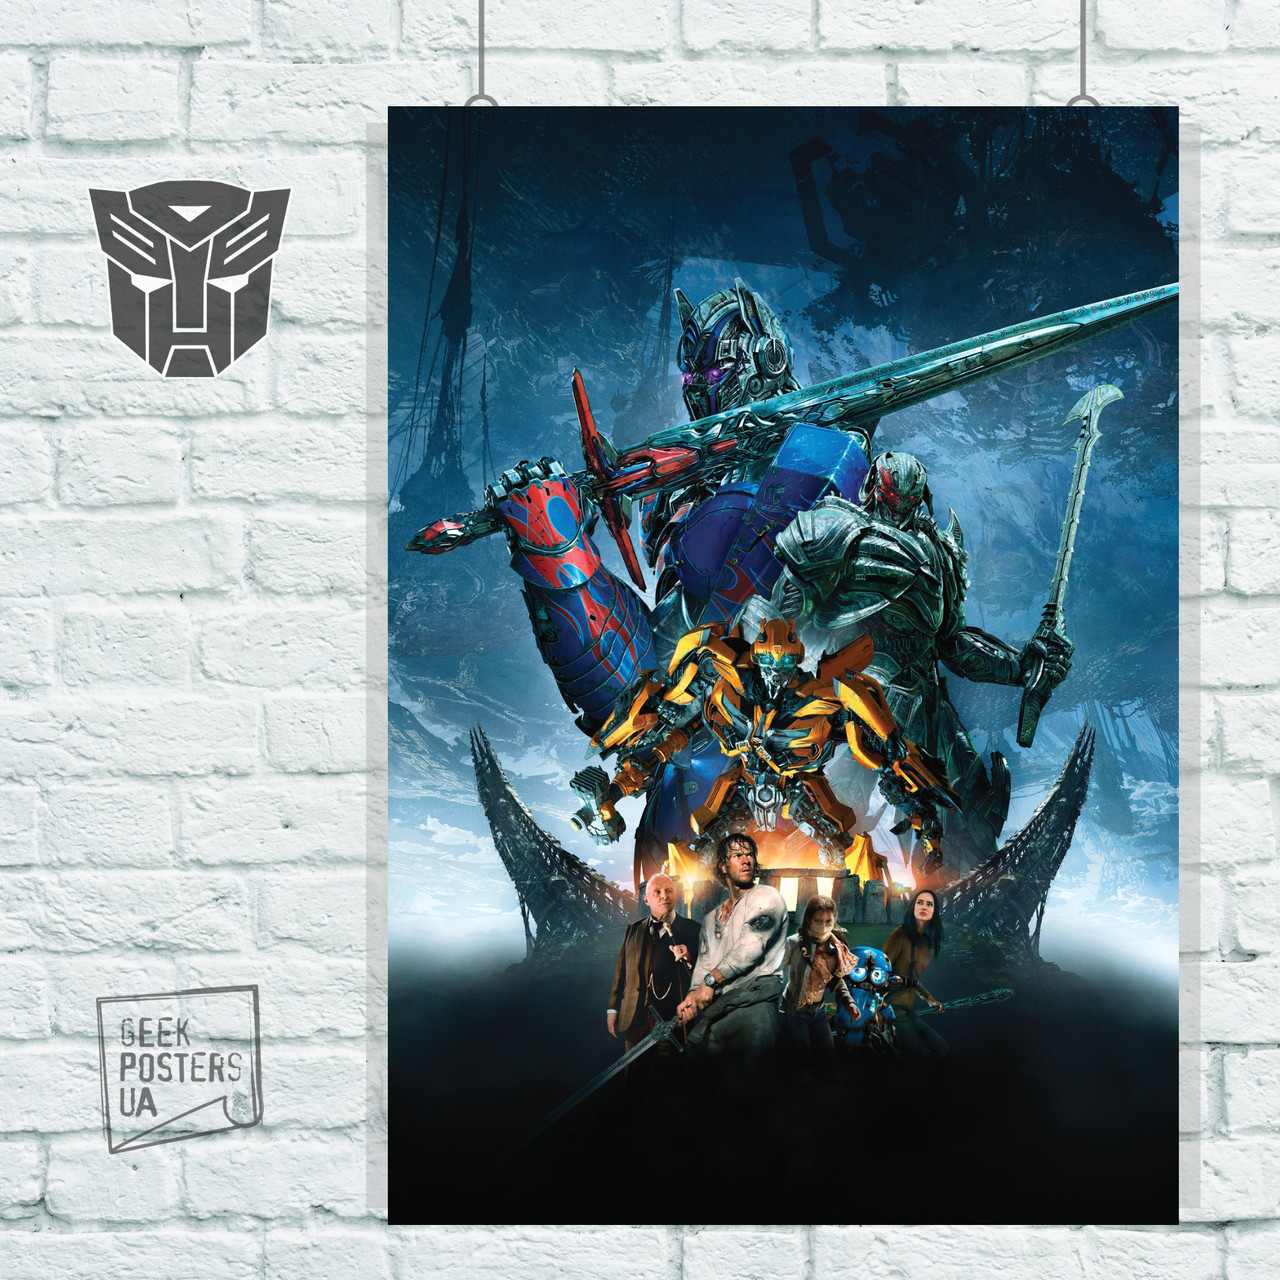 Постер Трансформеры 5: Последний рыцарь (2017). Размер 60x42см (A2). Глянцевая бумага